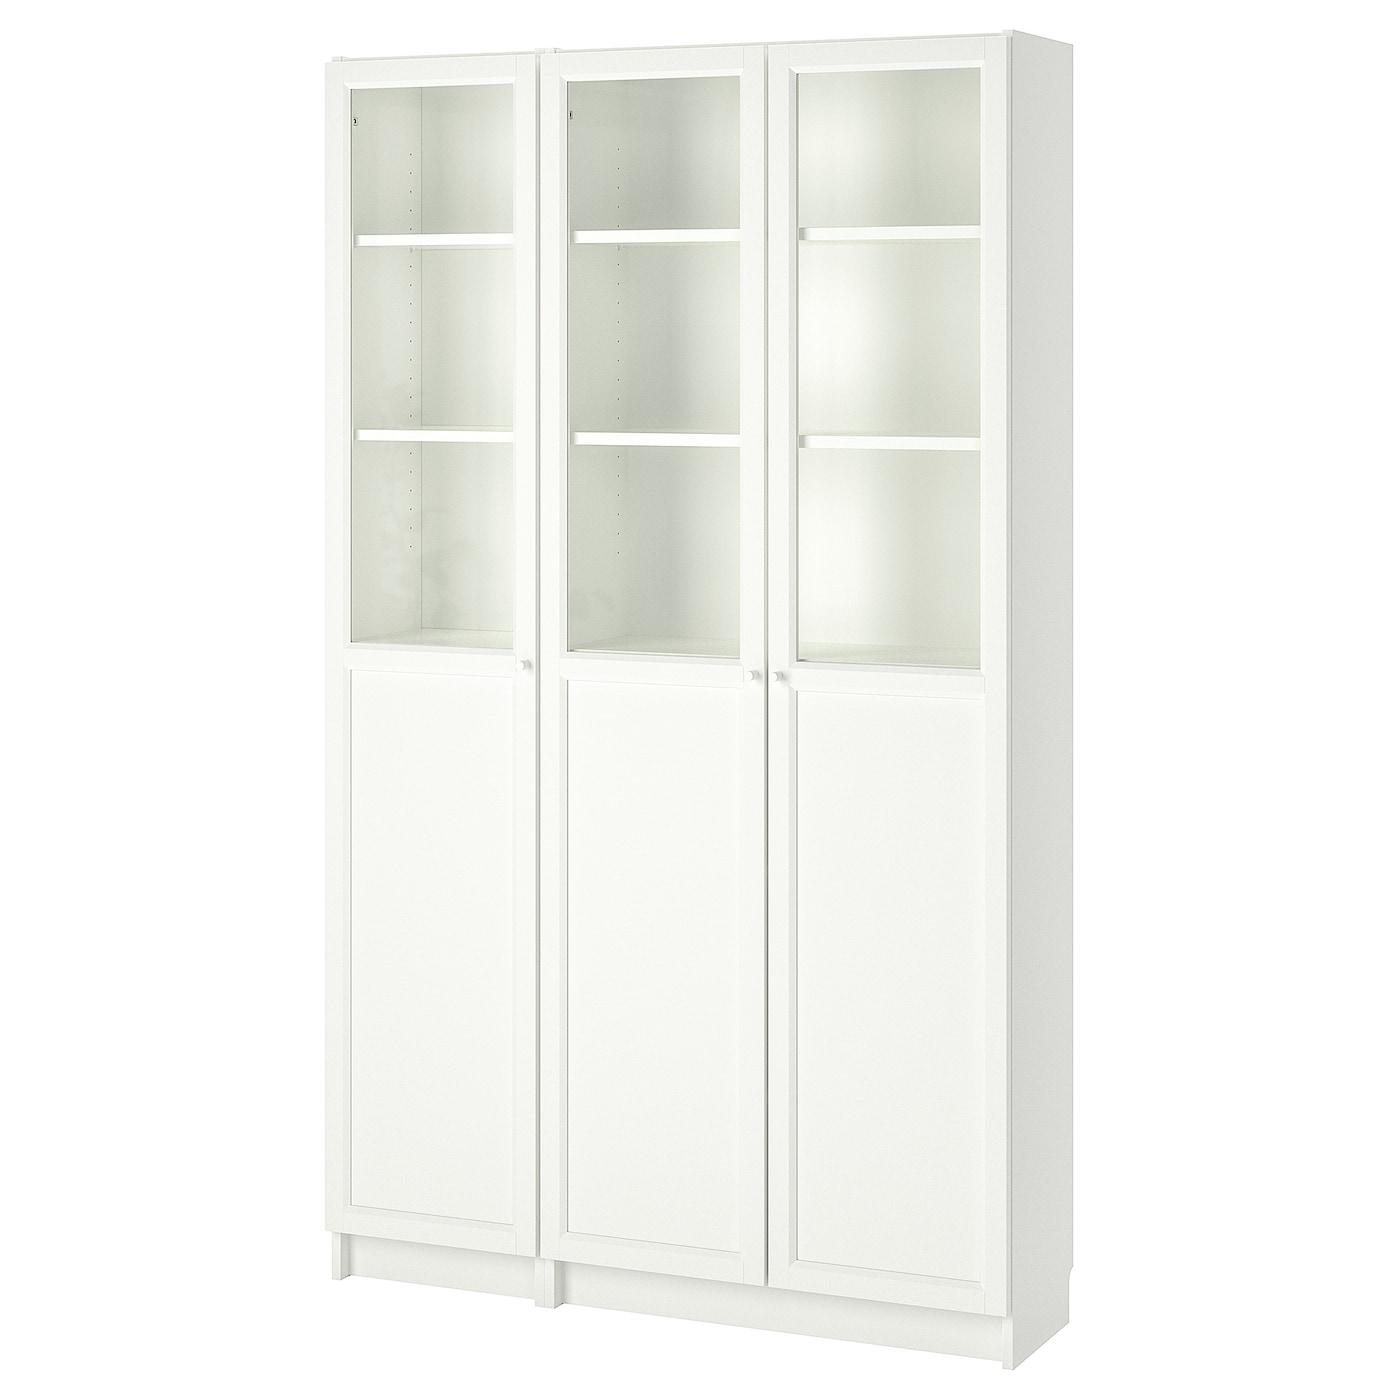 Billy Oxberg Bibliotheque Avec Panneau Vitrines Blanc Verre 120x30x202 Cm Ikea